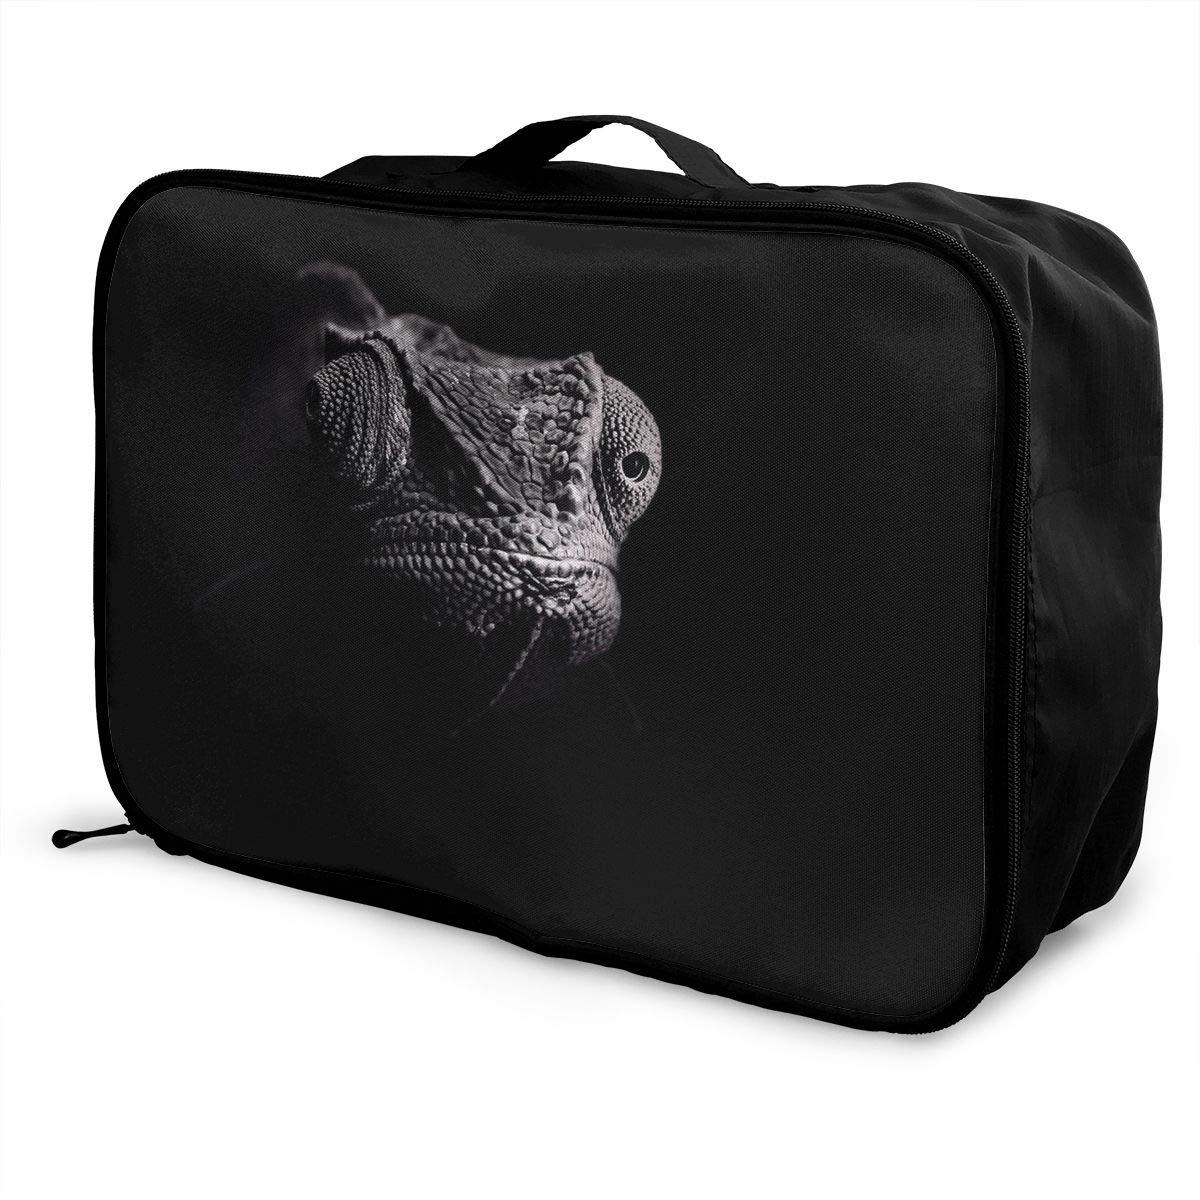 Travel Luggage Duffle Bag Lightweight Portable Handbag Gecko Pattern Large Capacity Waterproof Foldable Storage Tote